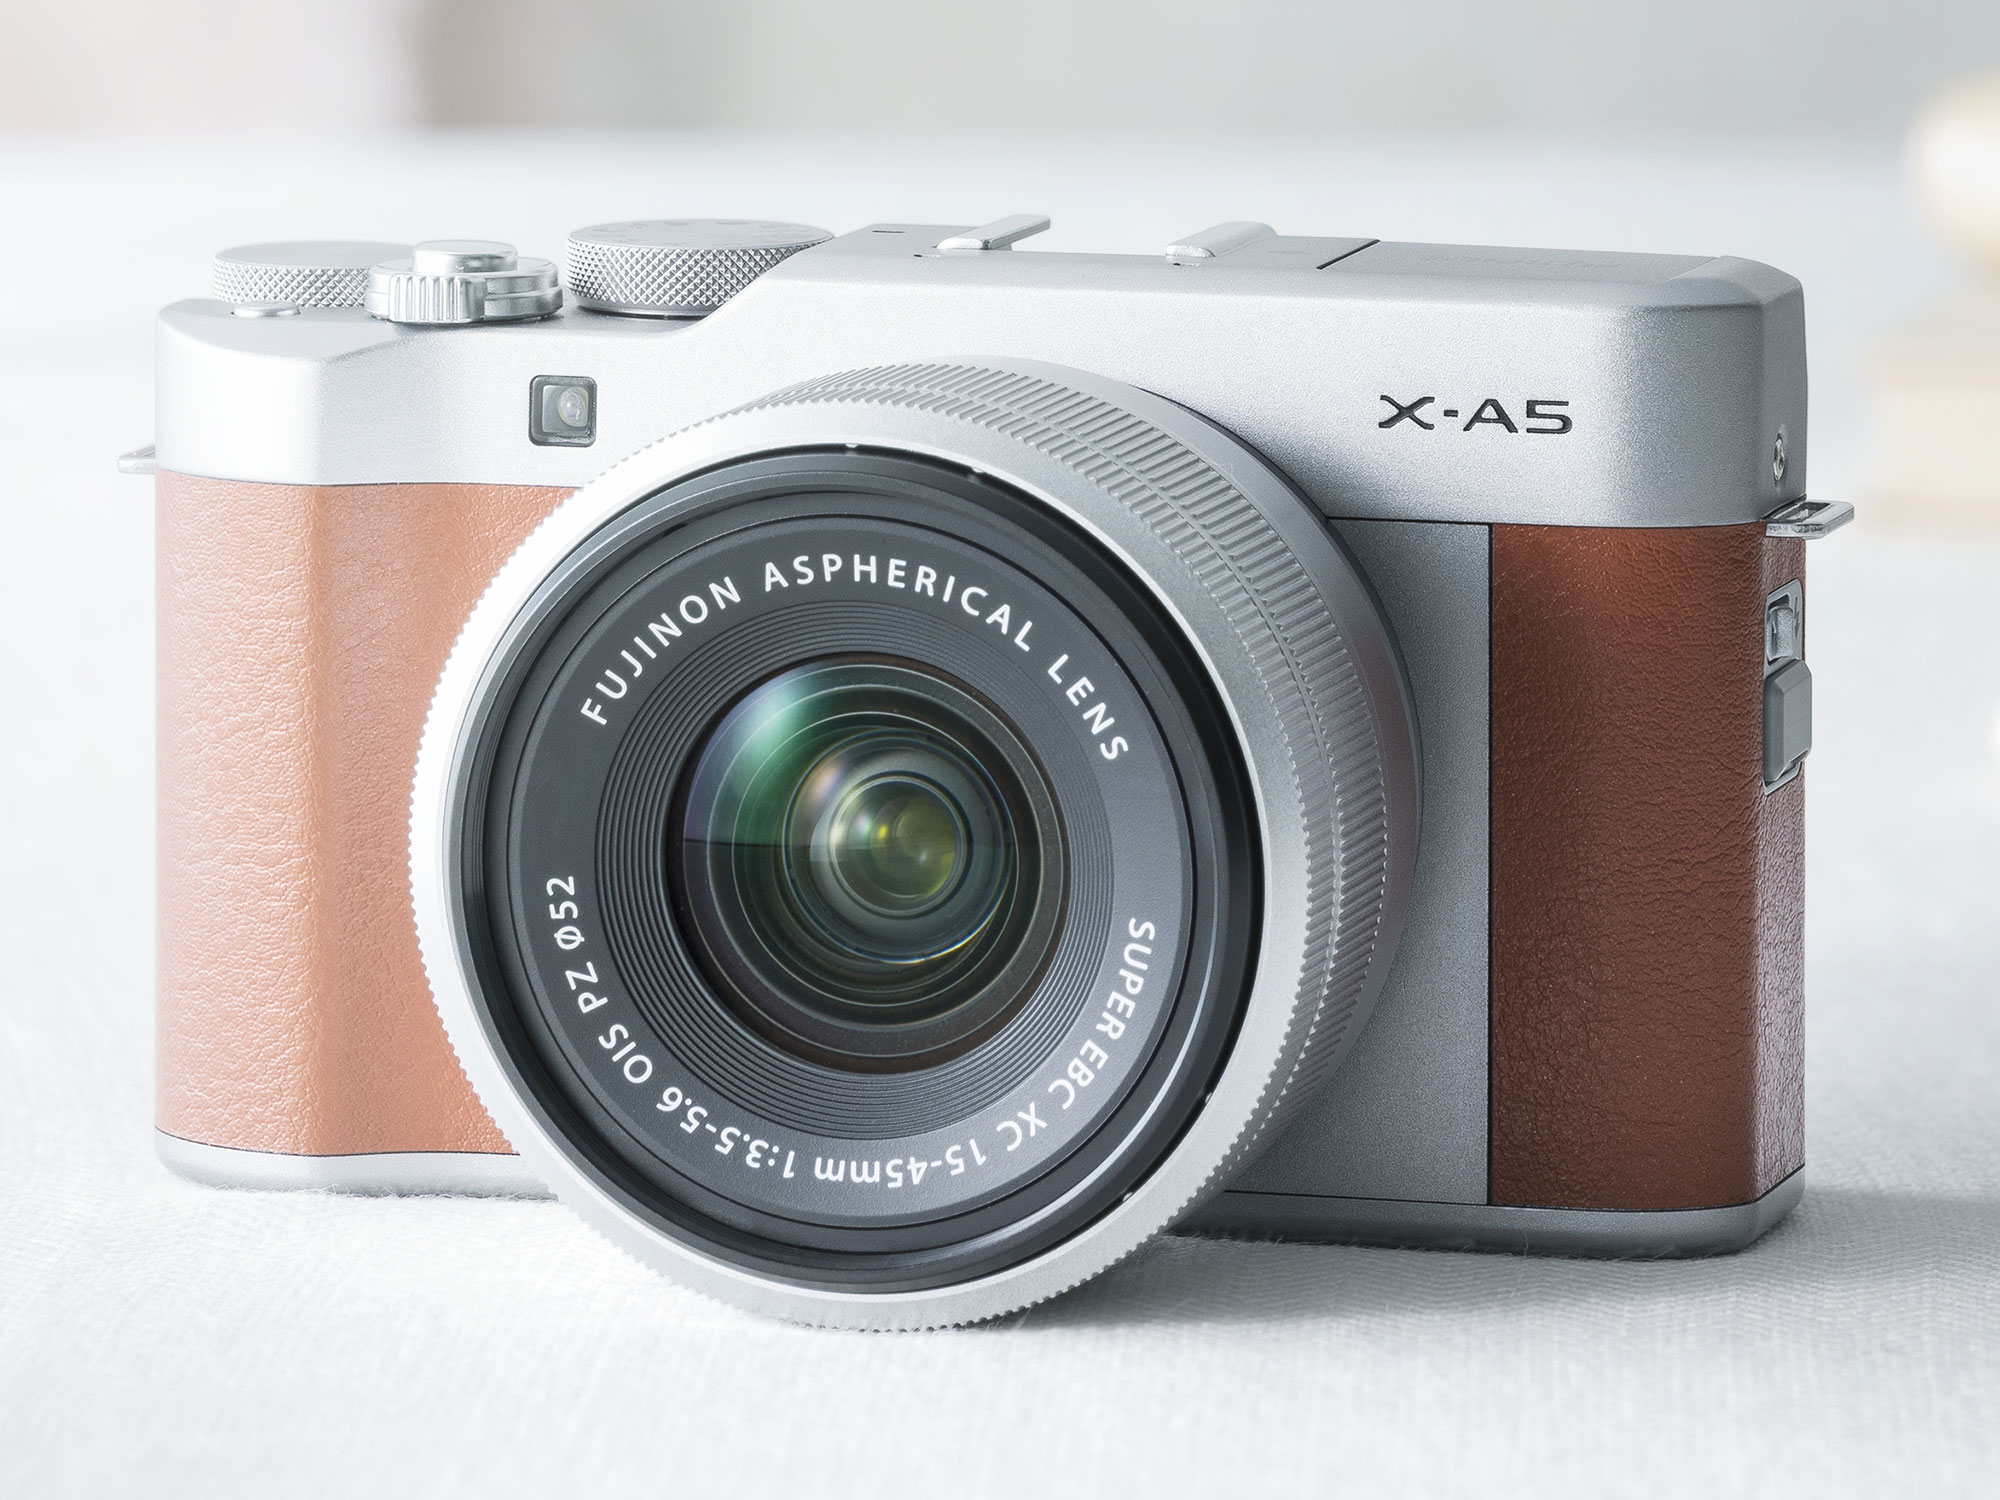 Fujifilm XA5 review - | Cameralabs